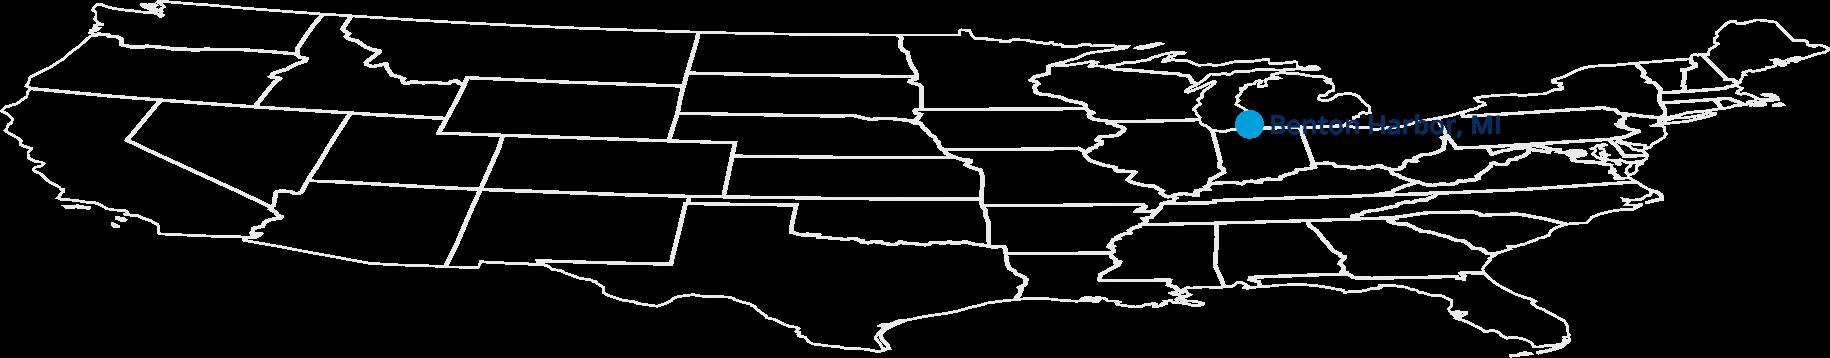 14_usa-map_headquarter@2x